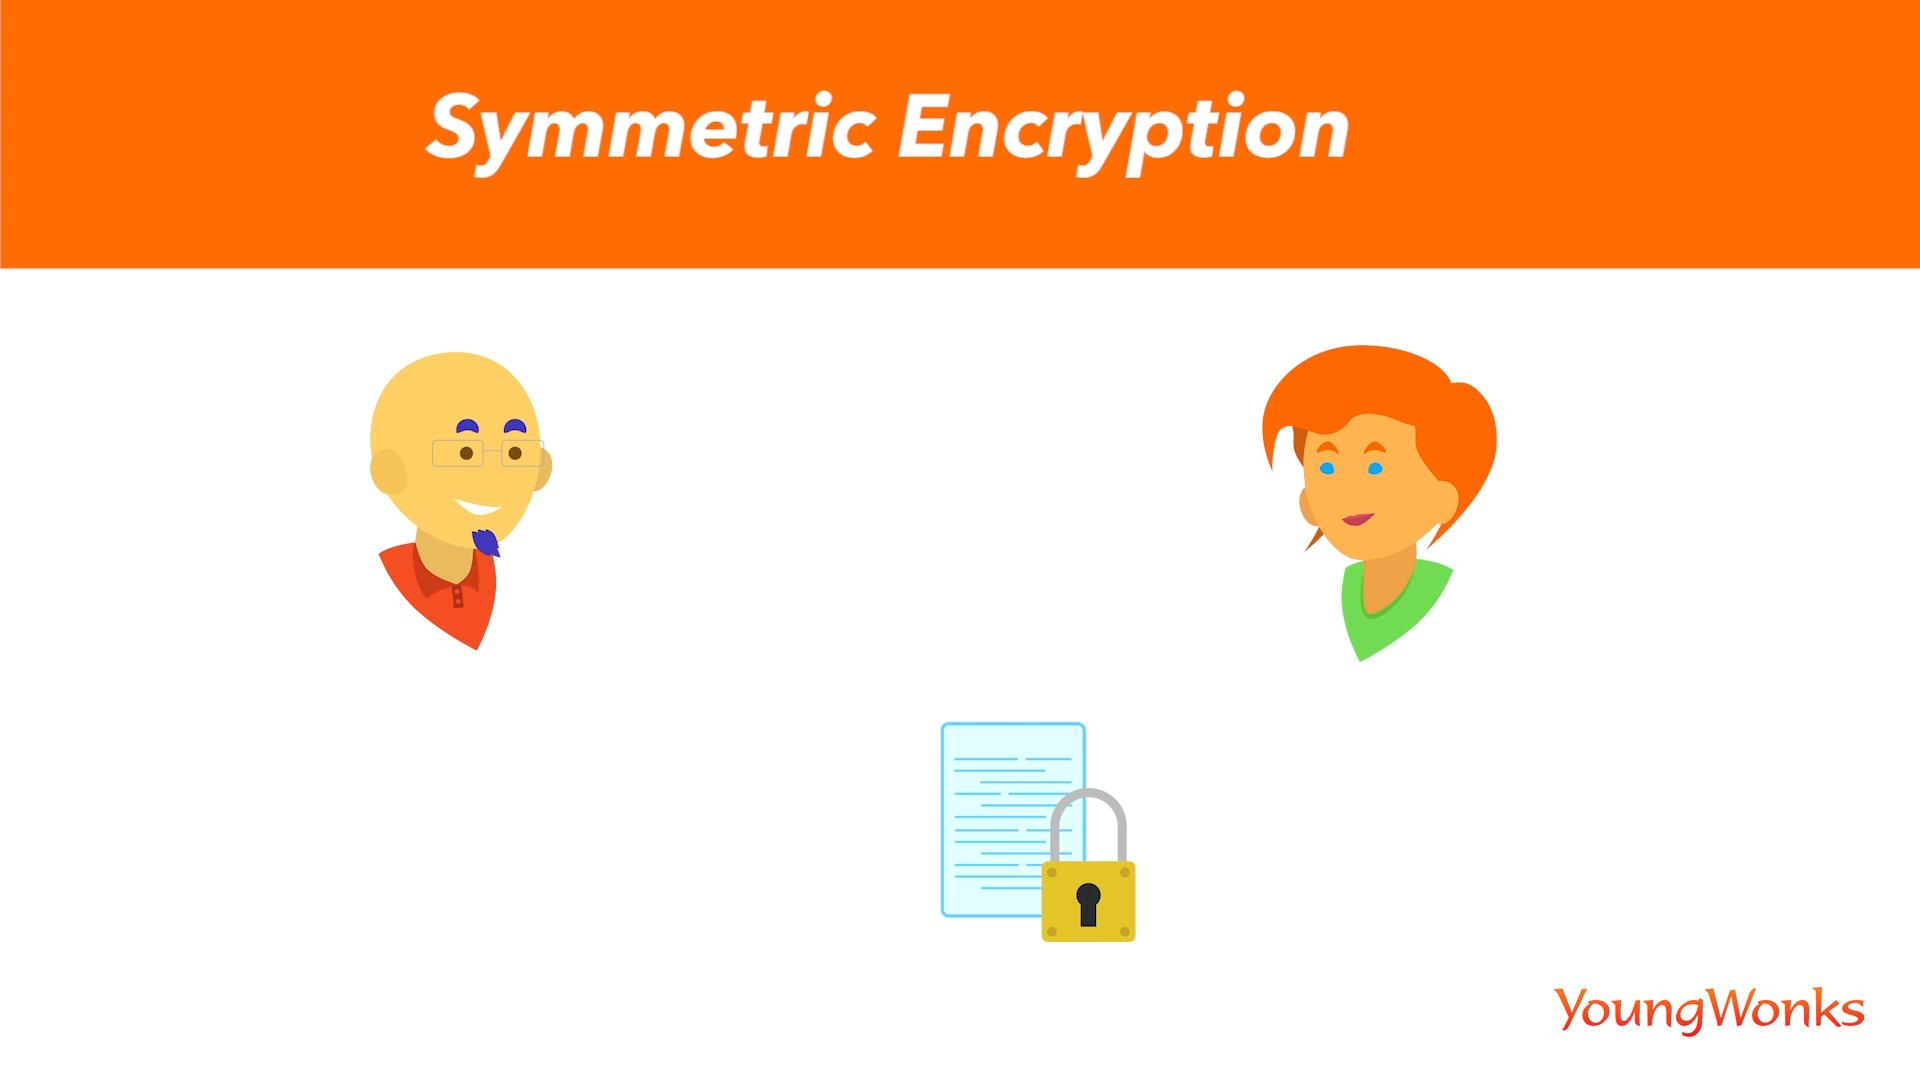 Bob sending encrypted message to Alice using symmetric encryption